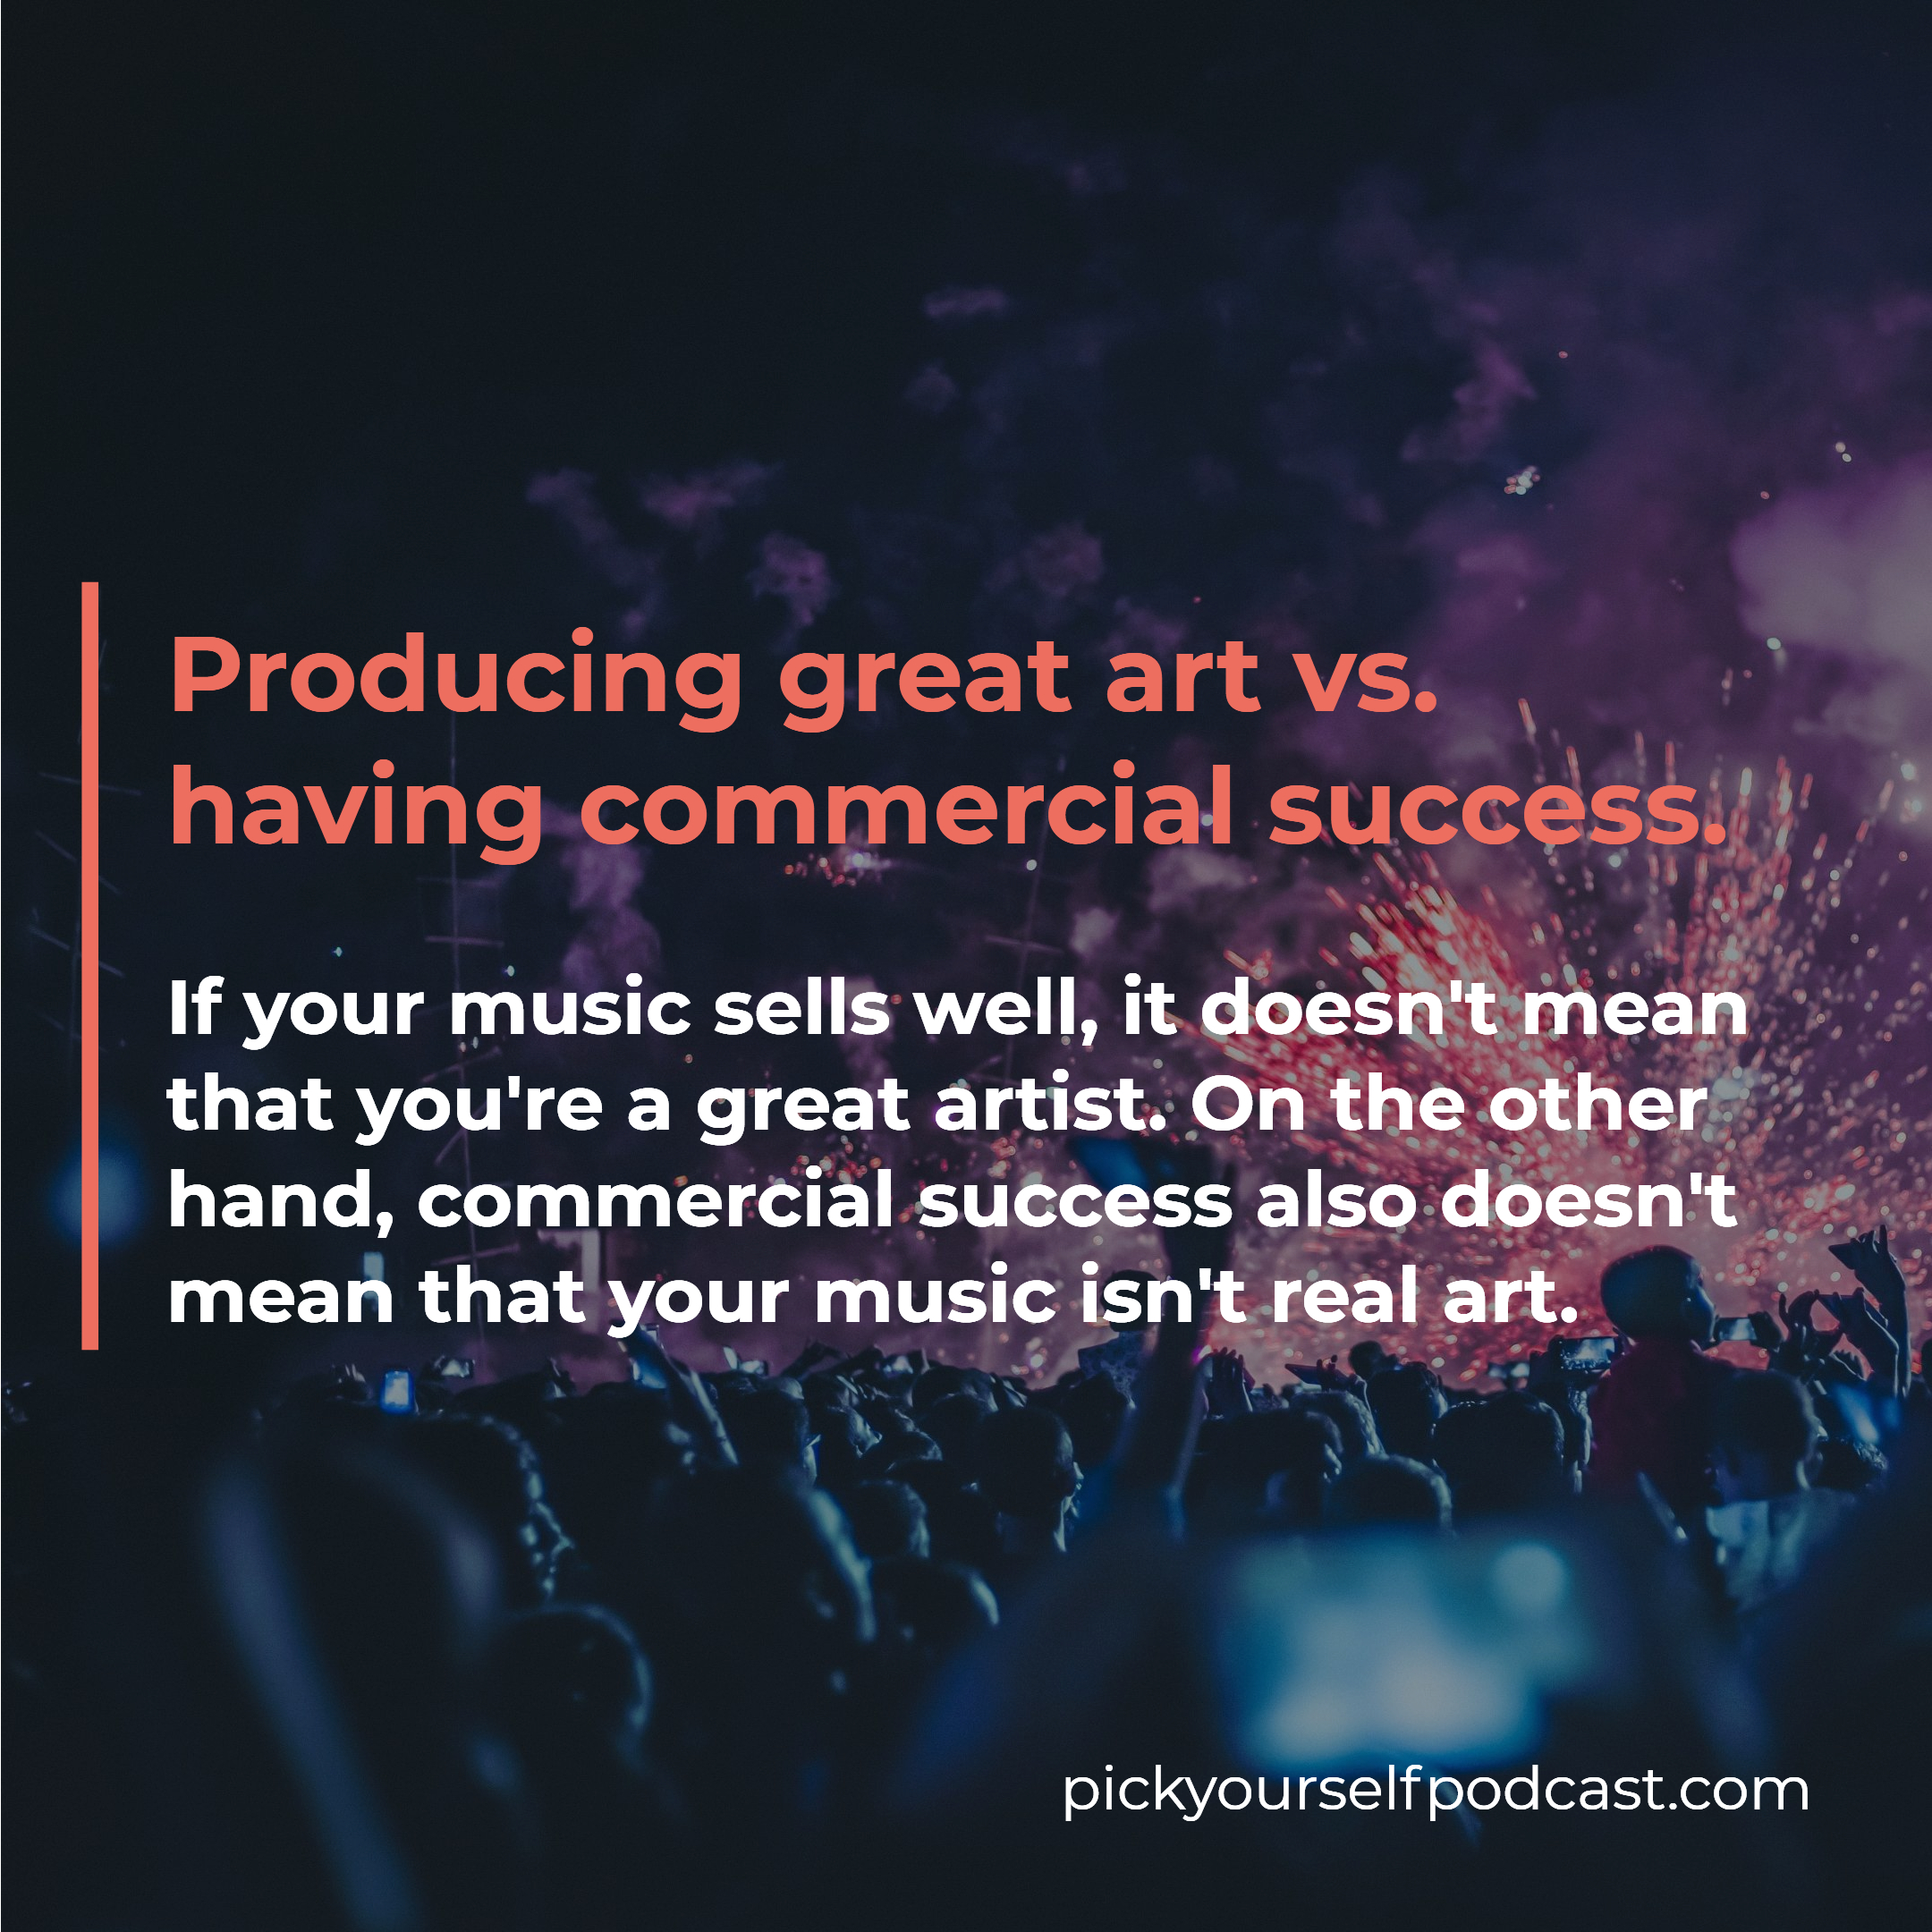 Art vs. capitalism visual 01: Producing great art vs. having commercial success.